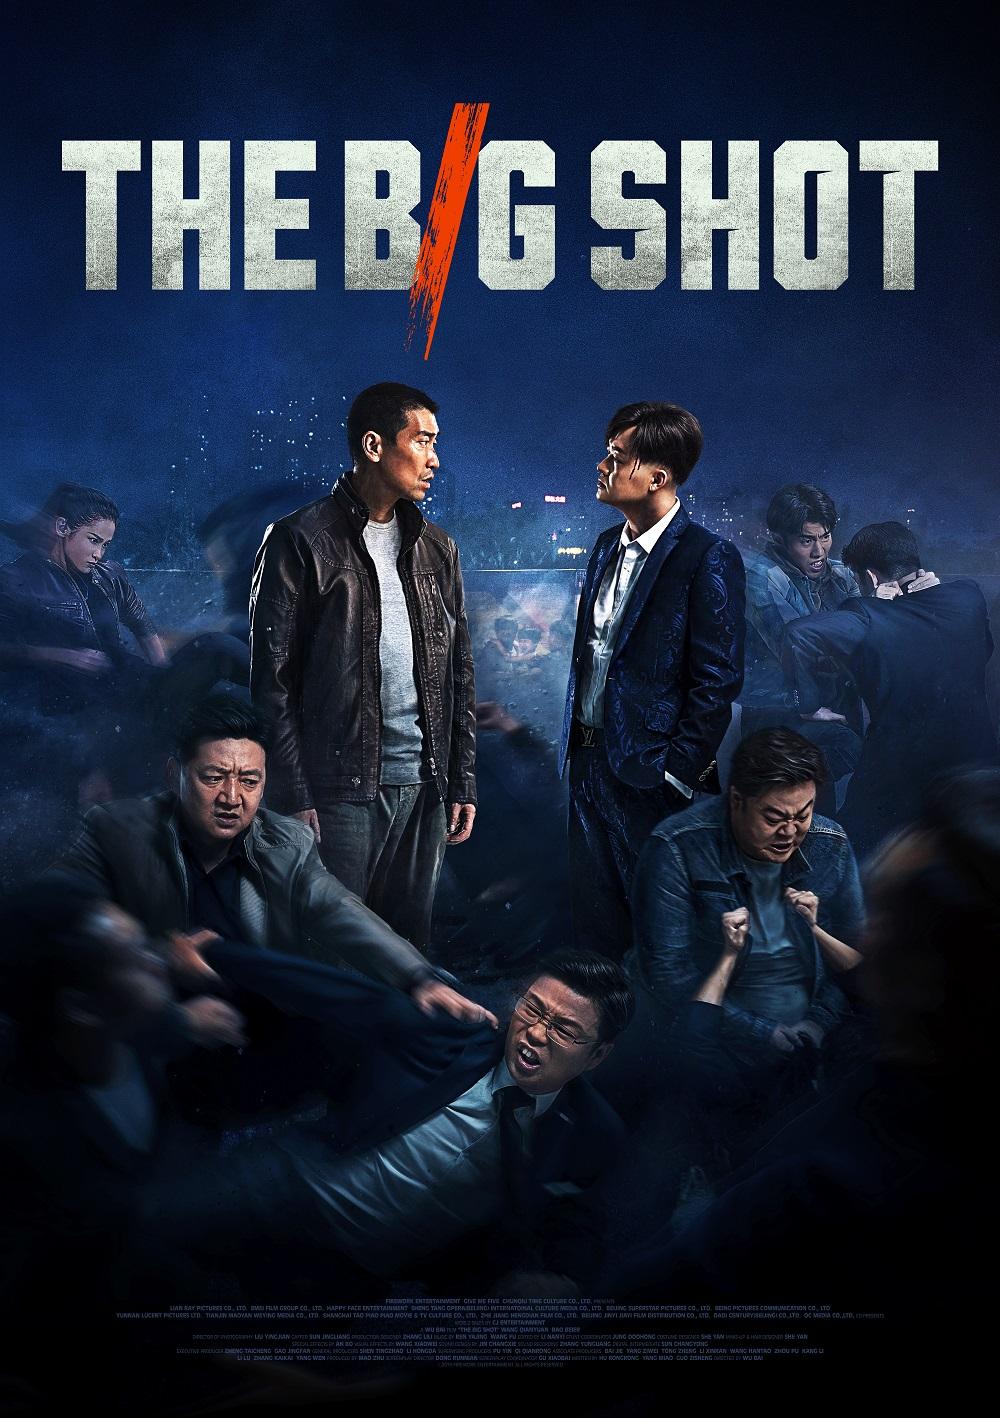 THE BIG SHOT_KEY_MN_intl.jpg